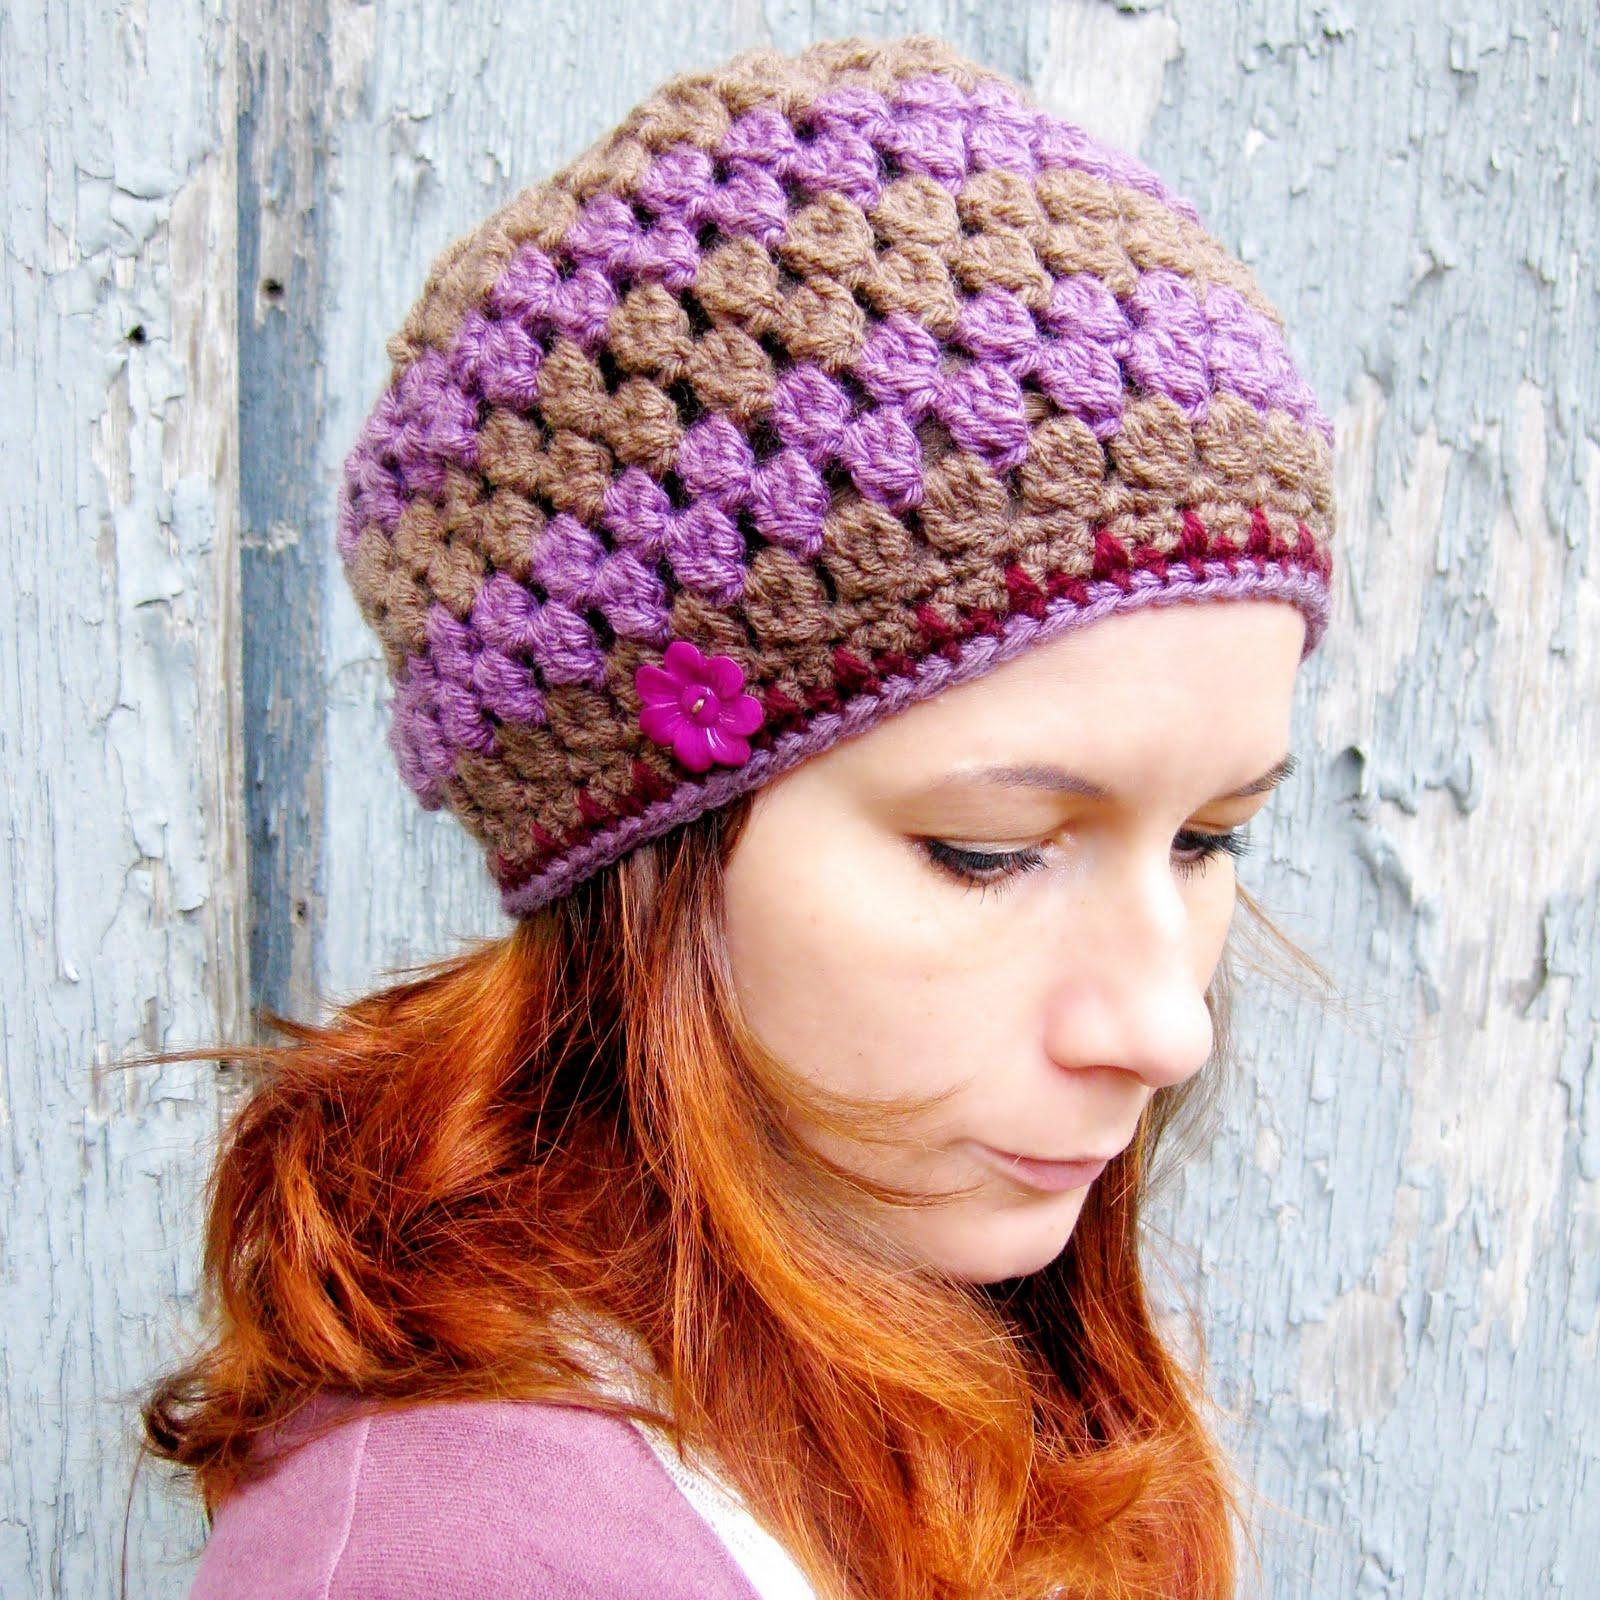 Handmade by viki free pdf crochet pattern free pdf crochet pattern bankloansurffo Image collections